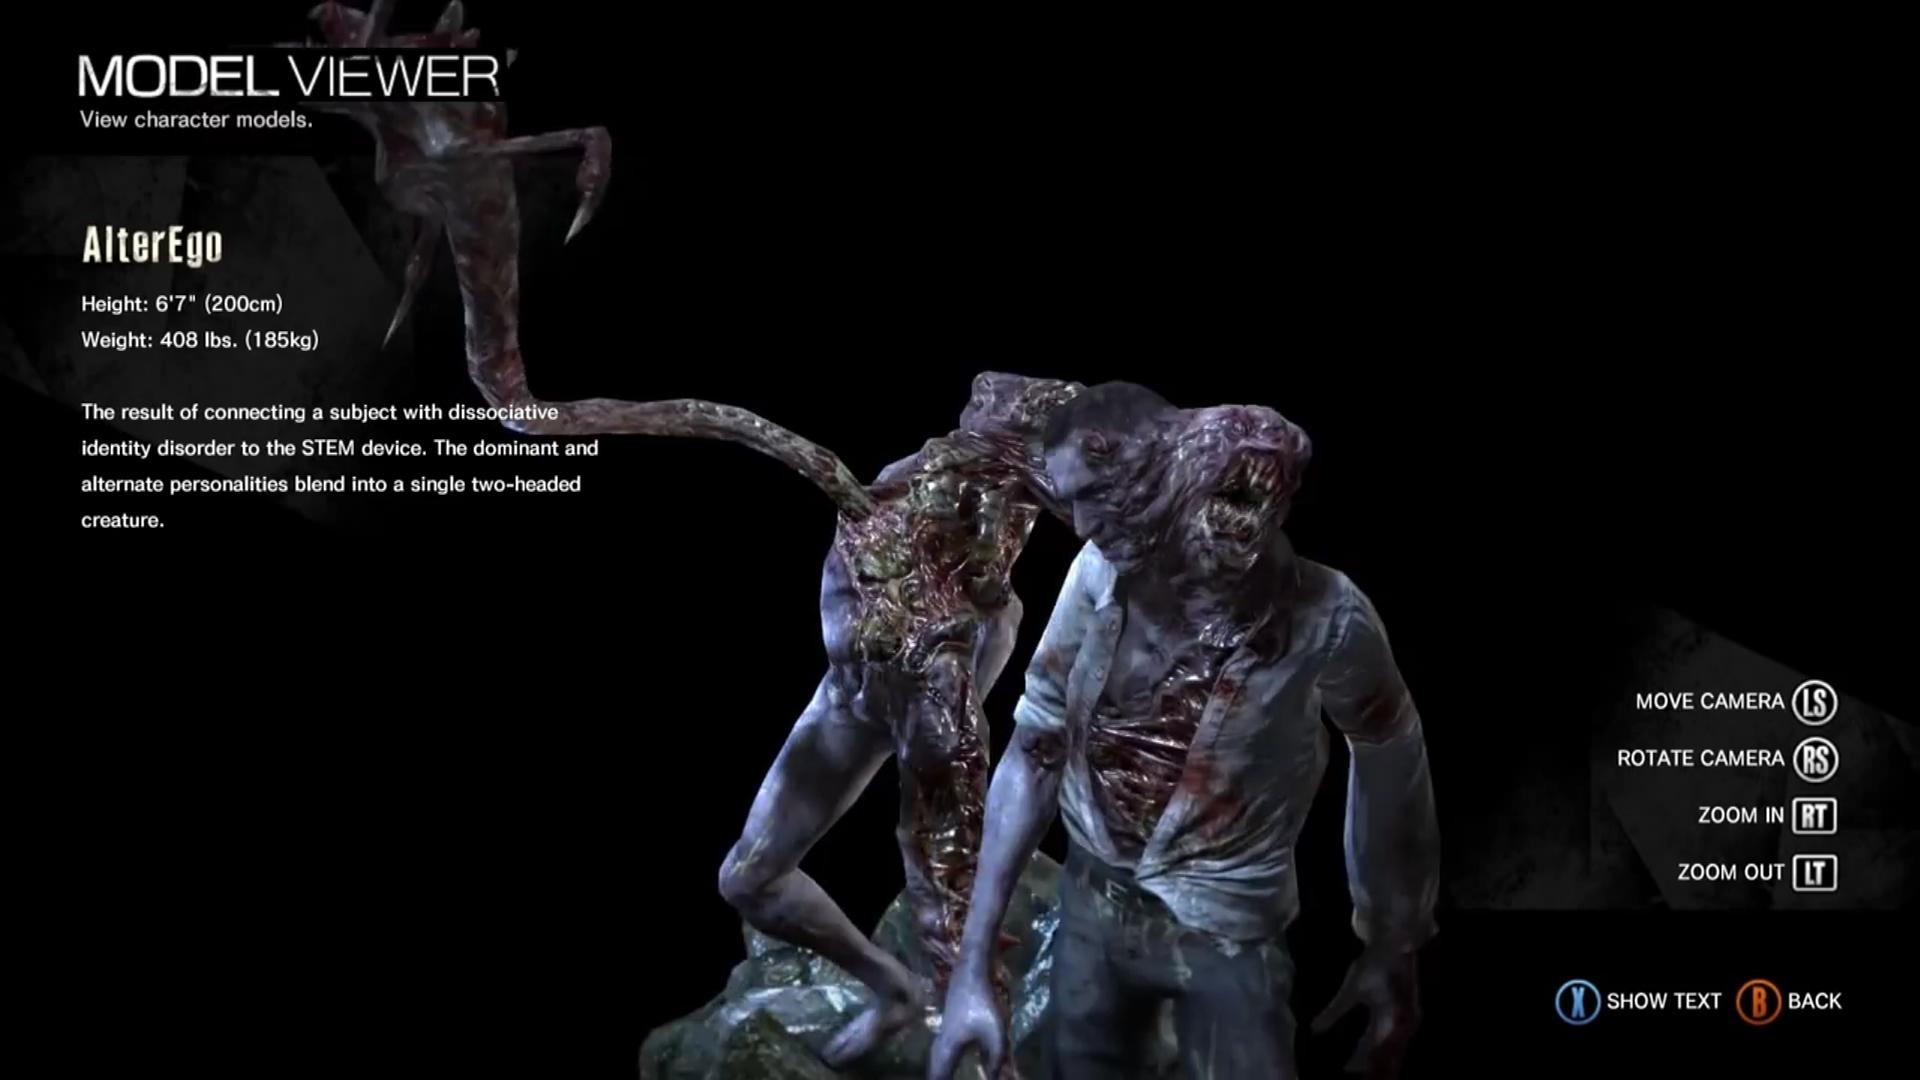 Resident Evil 2 (2019 video game) - Wikipedia